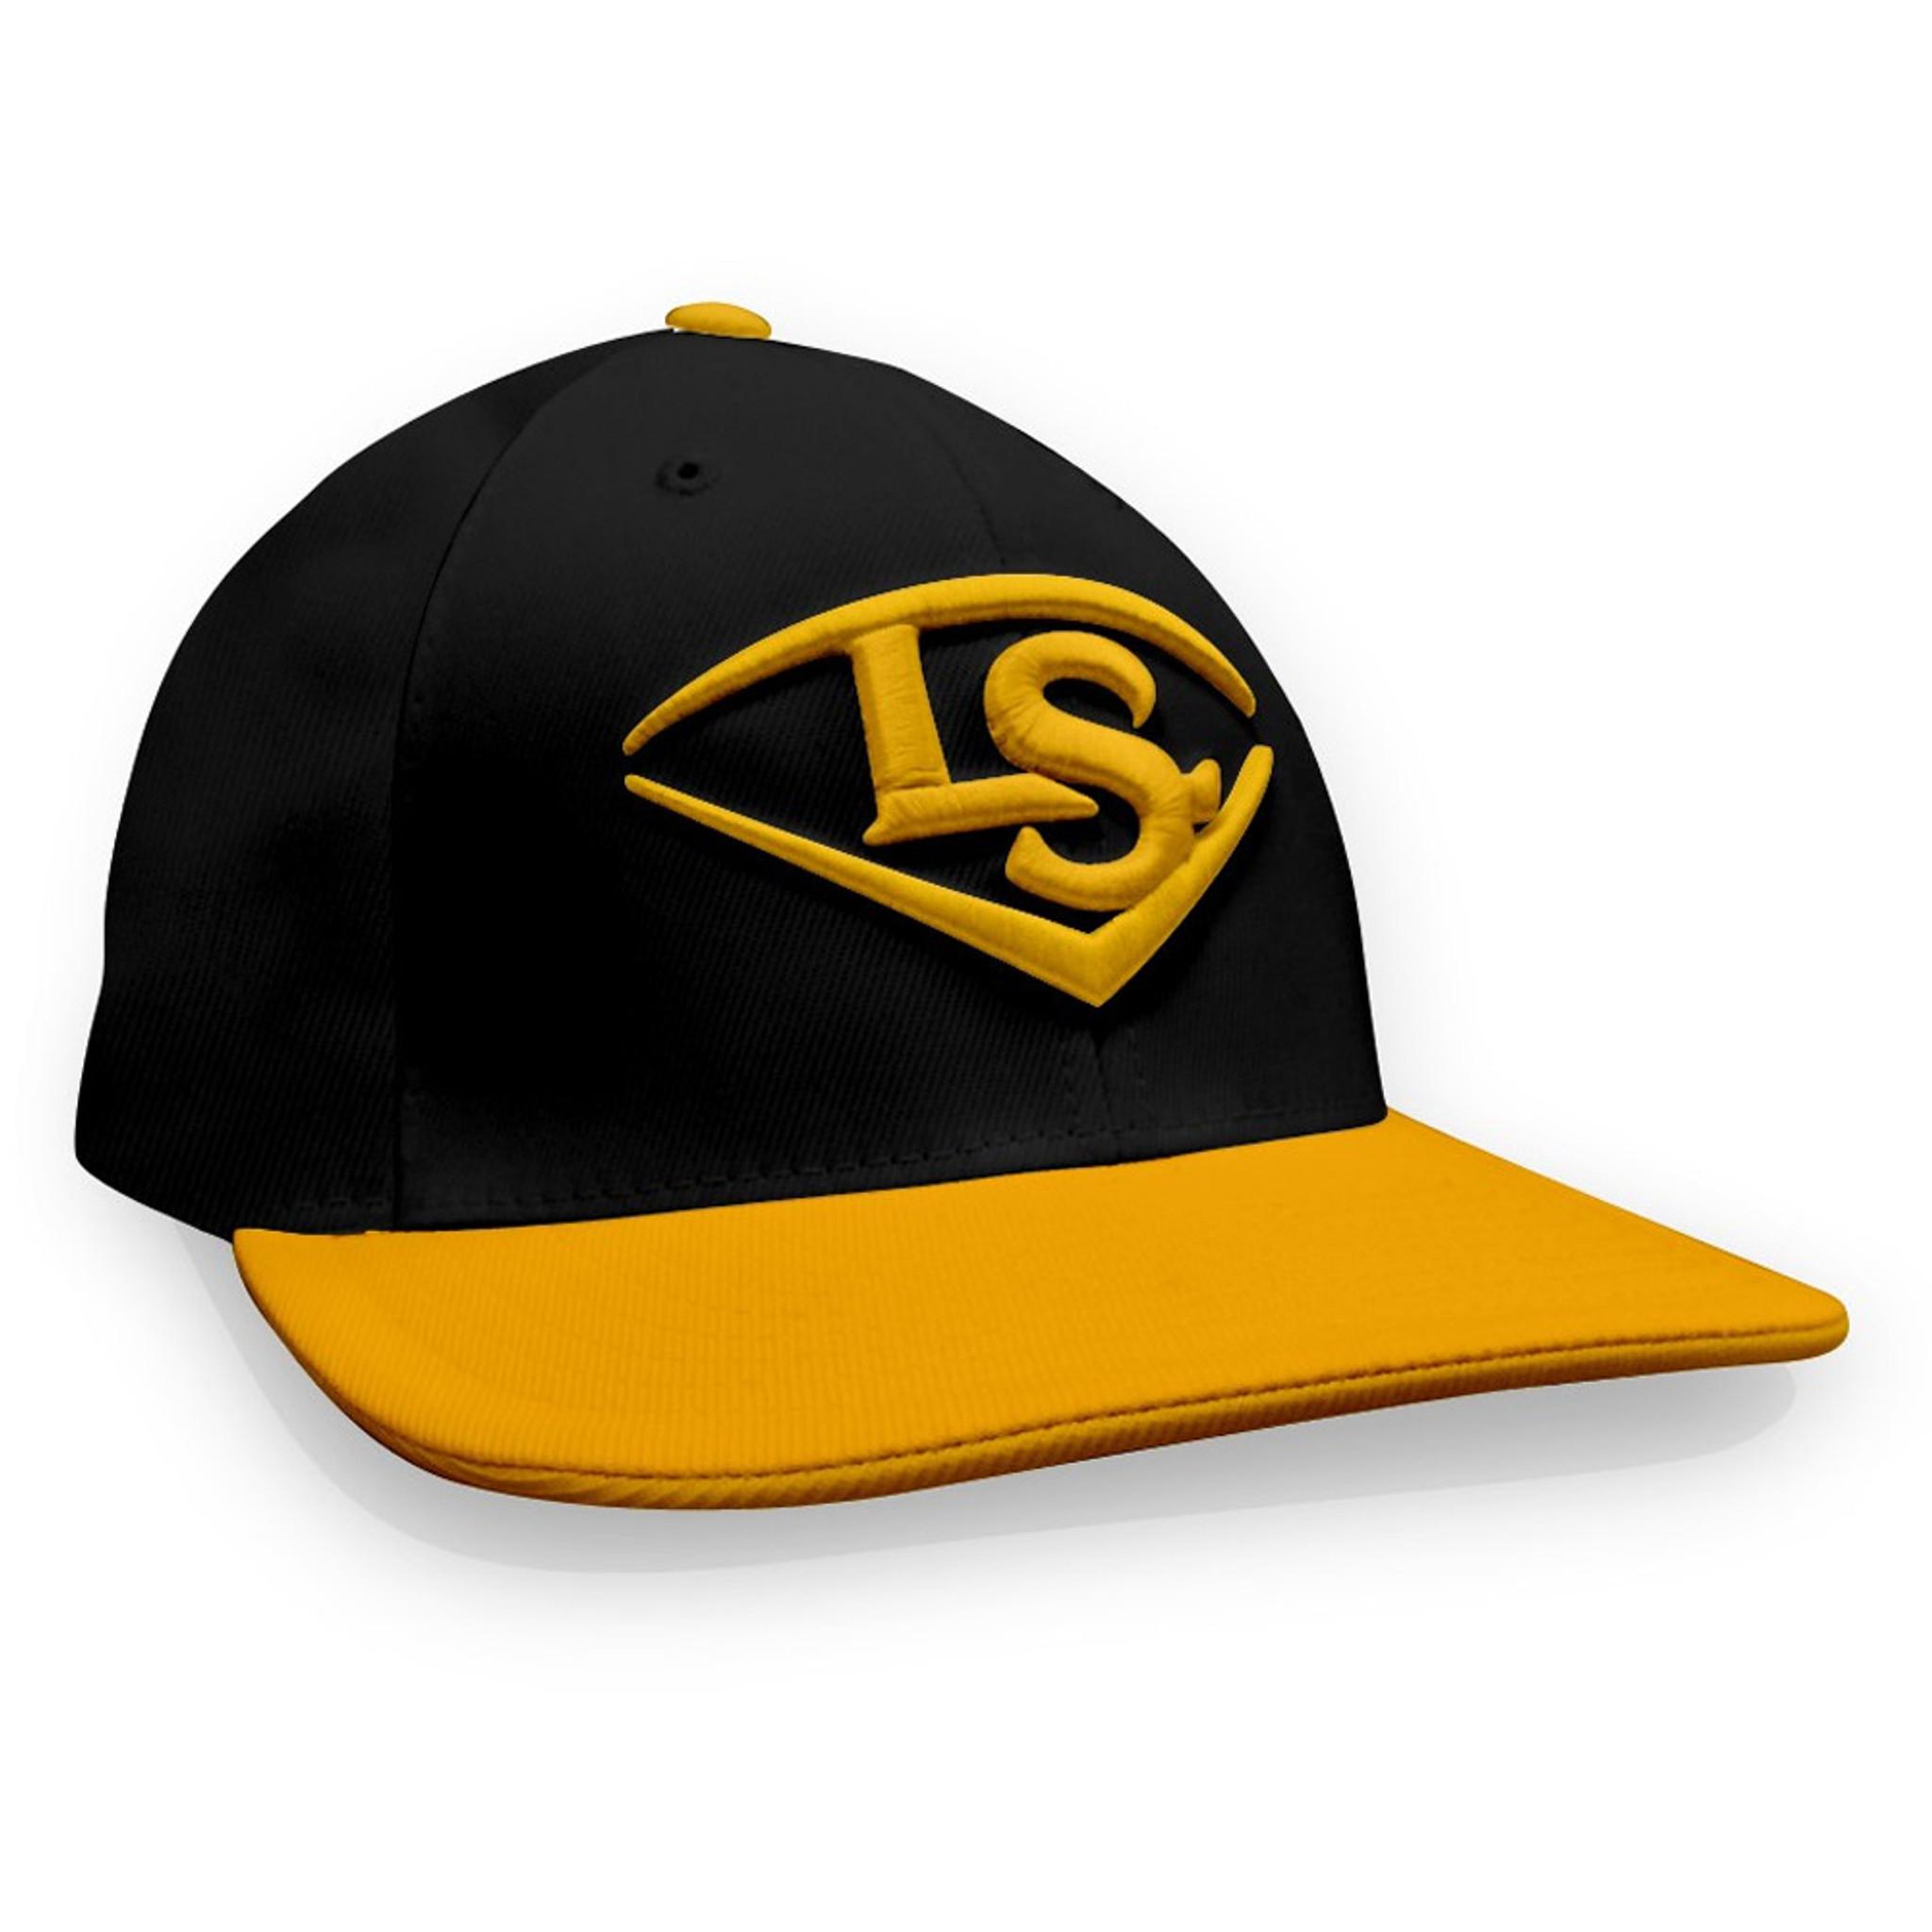 6cf873df0 Louisville Slugger Flat Bill Richardson Model PTS20 Baseball/Softball  Trucker Hat - BPAthletics.com